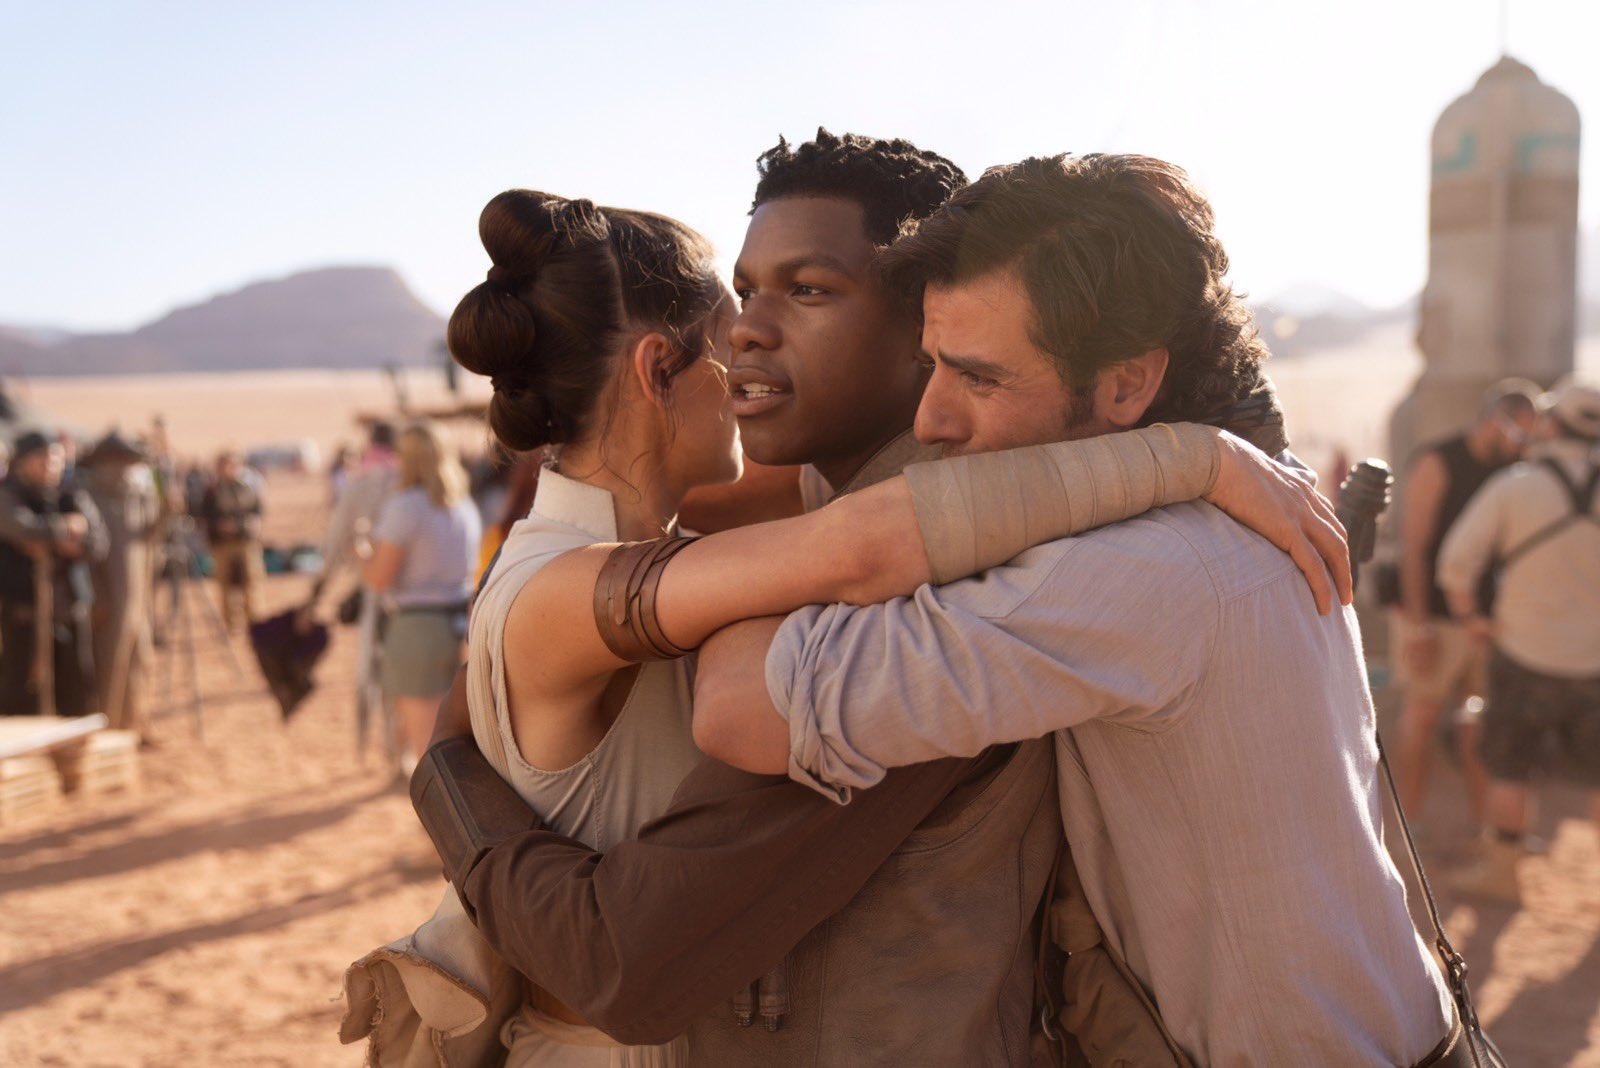 Star Wars Episode IX wraps